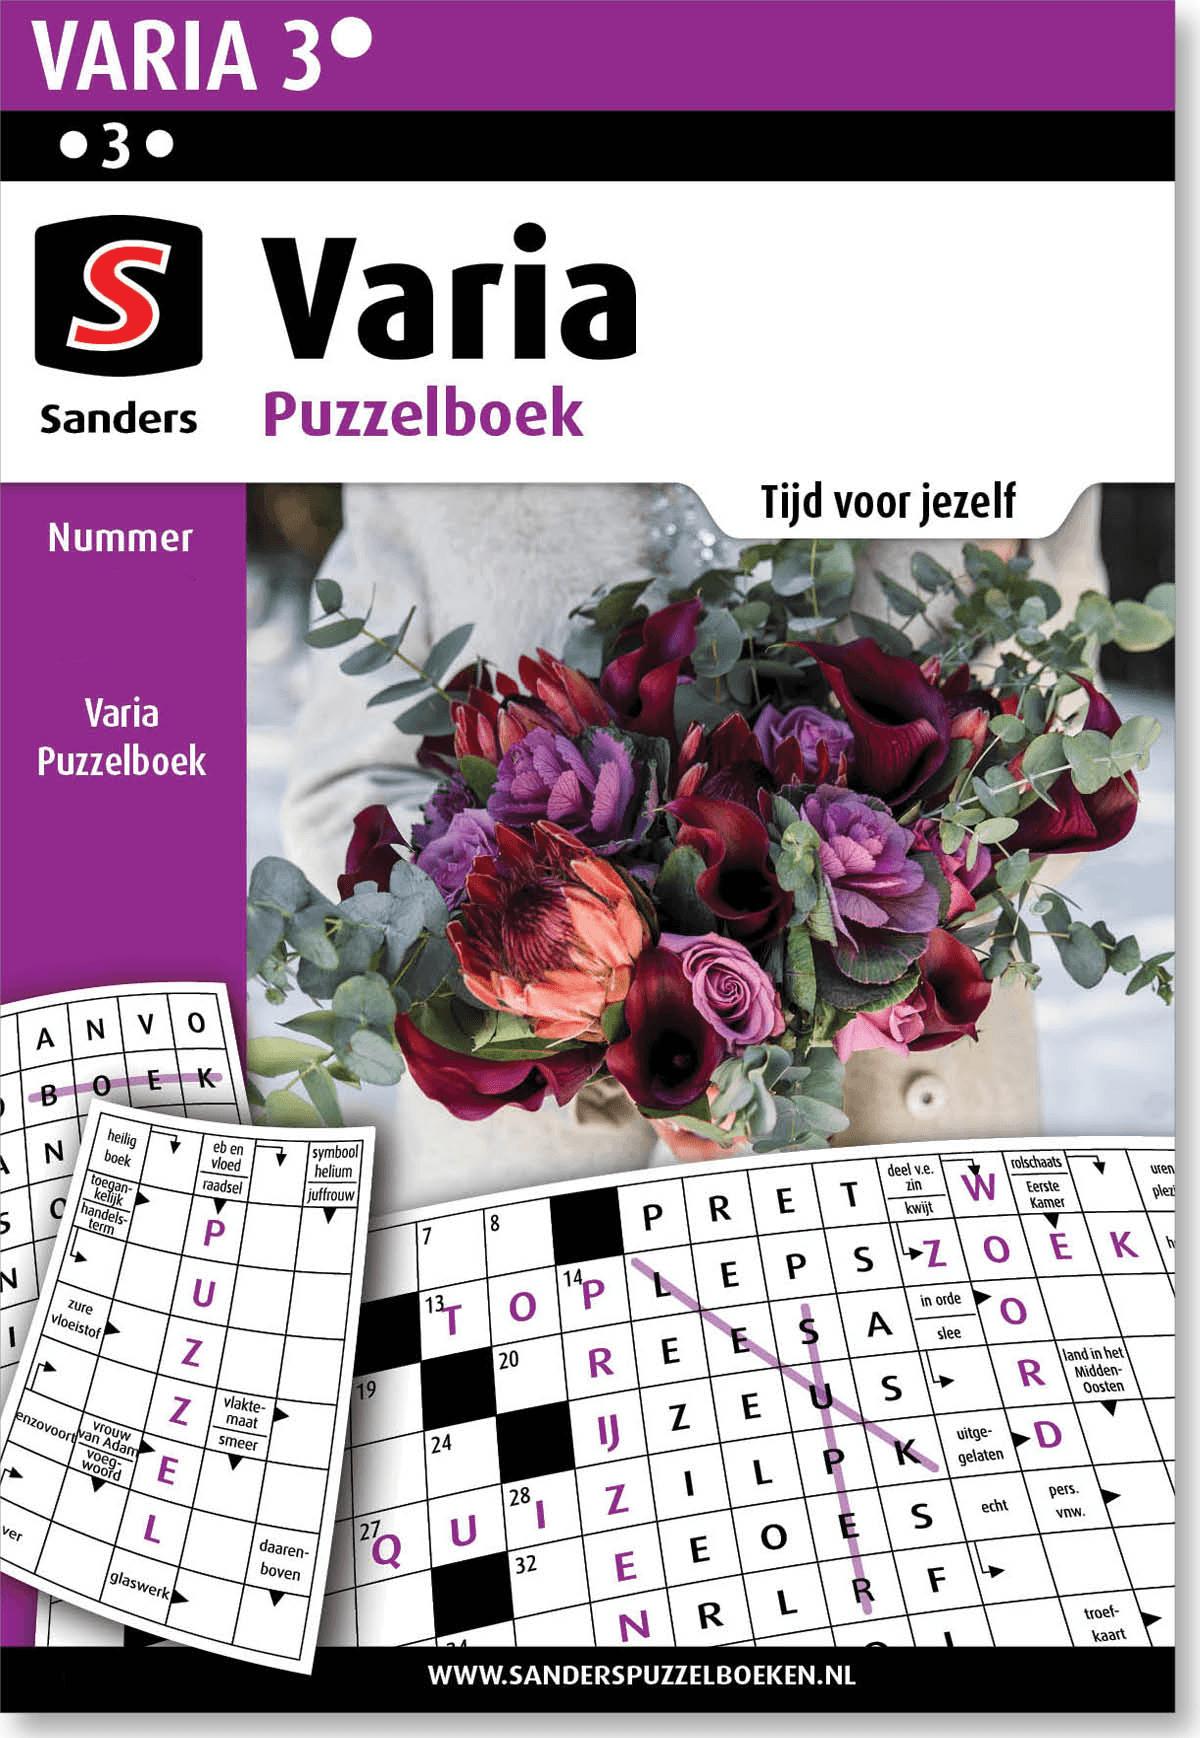 Abonnement Varia Puzzelboek